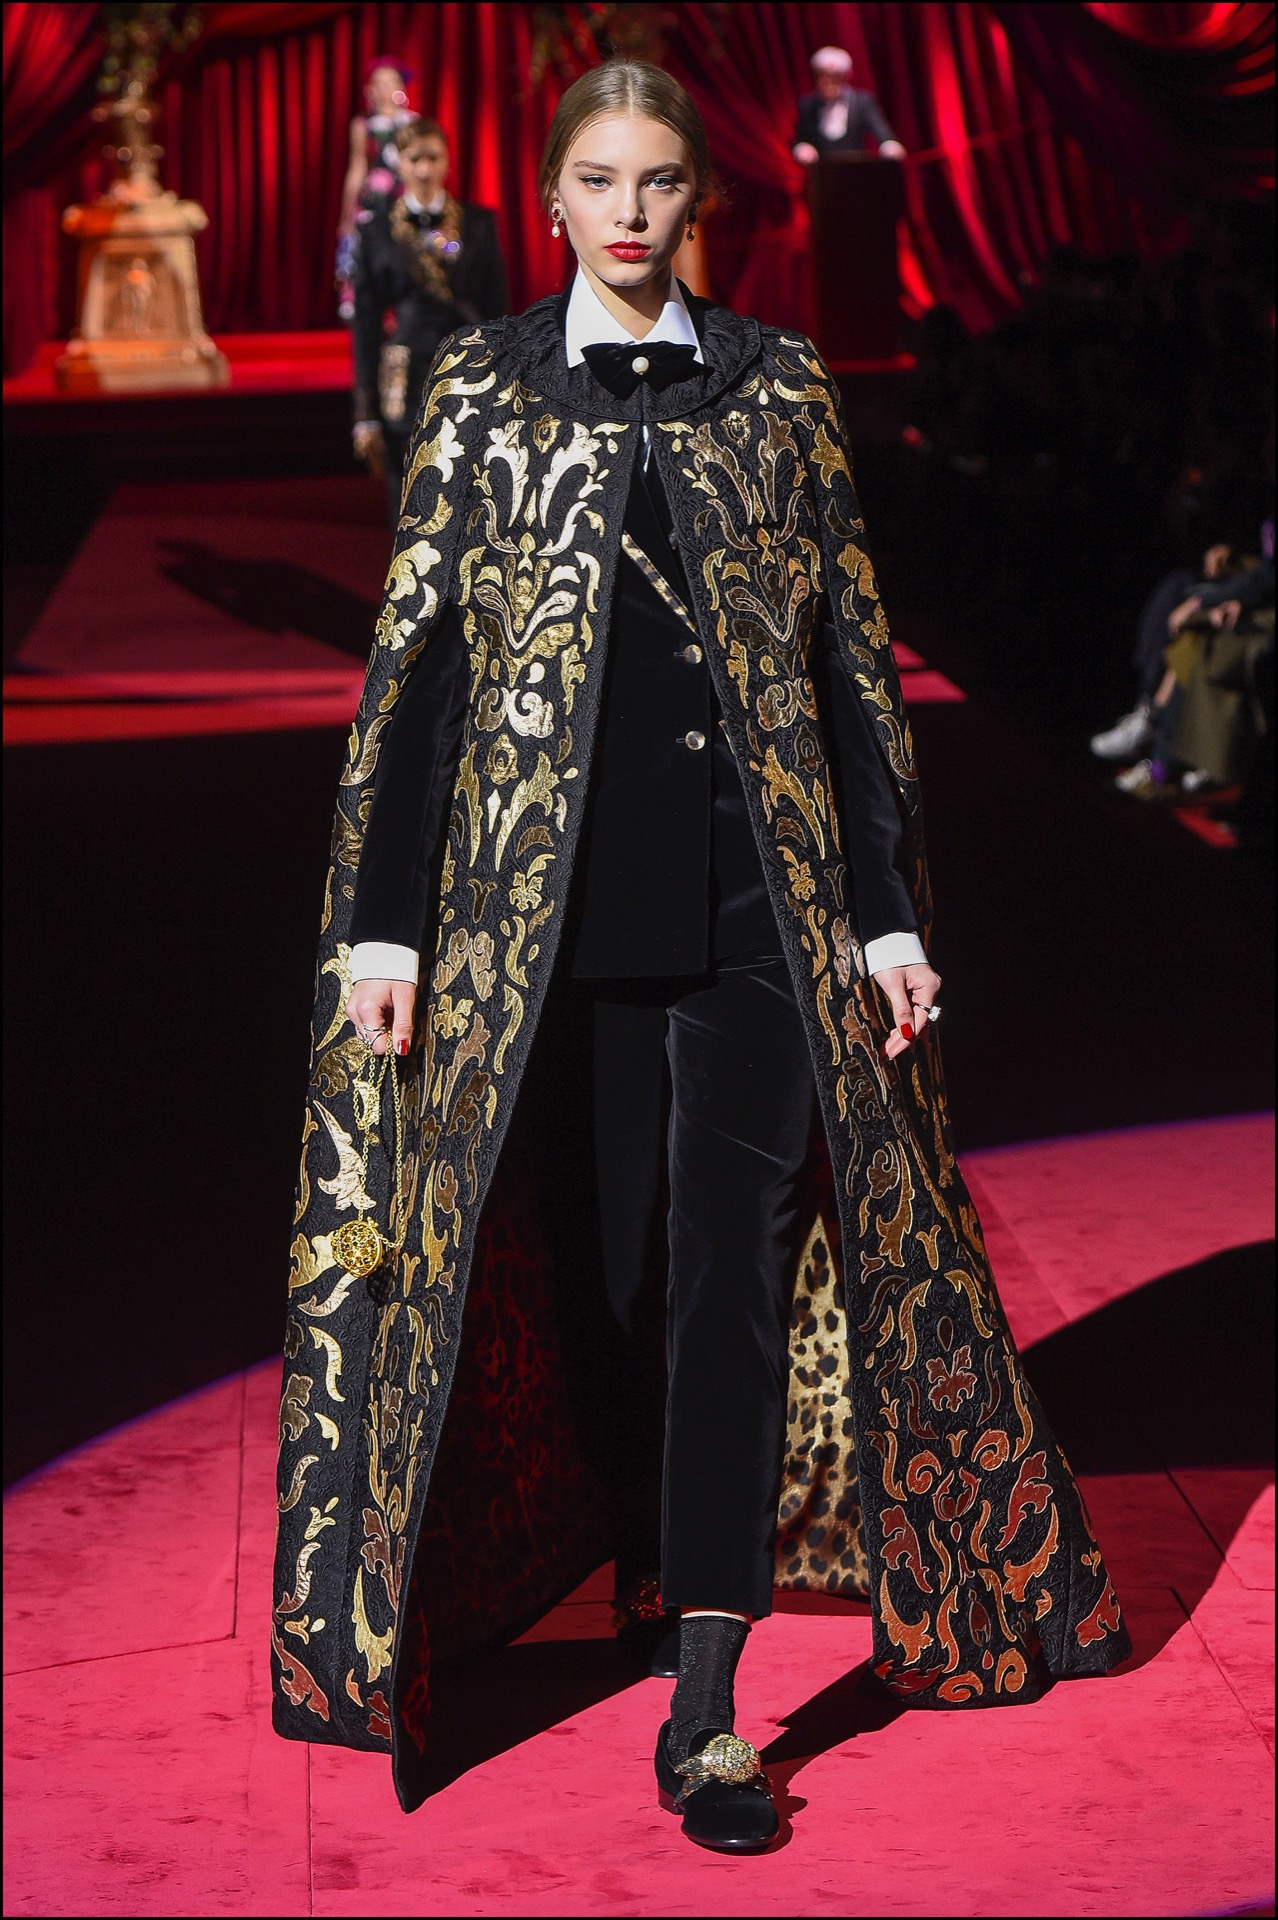 DÈfilÈ de mode Dolce & Gabbana lors de la fashion week automne/Hiver 2019/2020 ‡ Milan, le 24 fÈvrier 2019 Dolce & Gabbana show at Milan Fashion Week Autumn/Winter 2019/20 on February 20, 2019 in Milan, Italy.